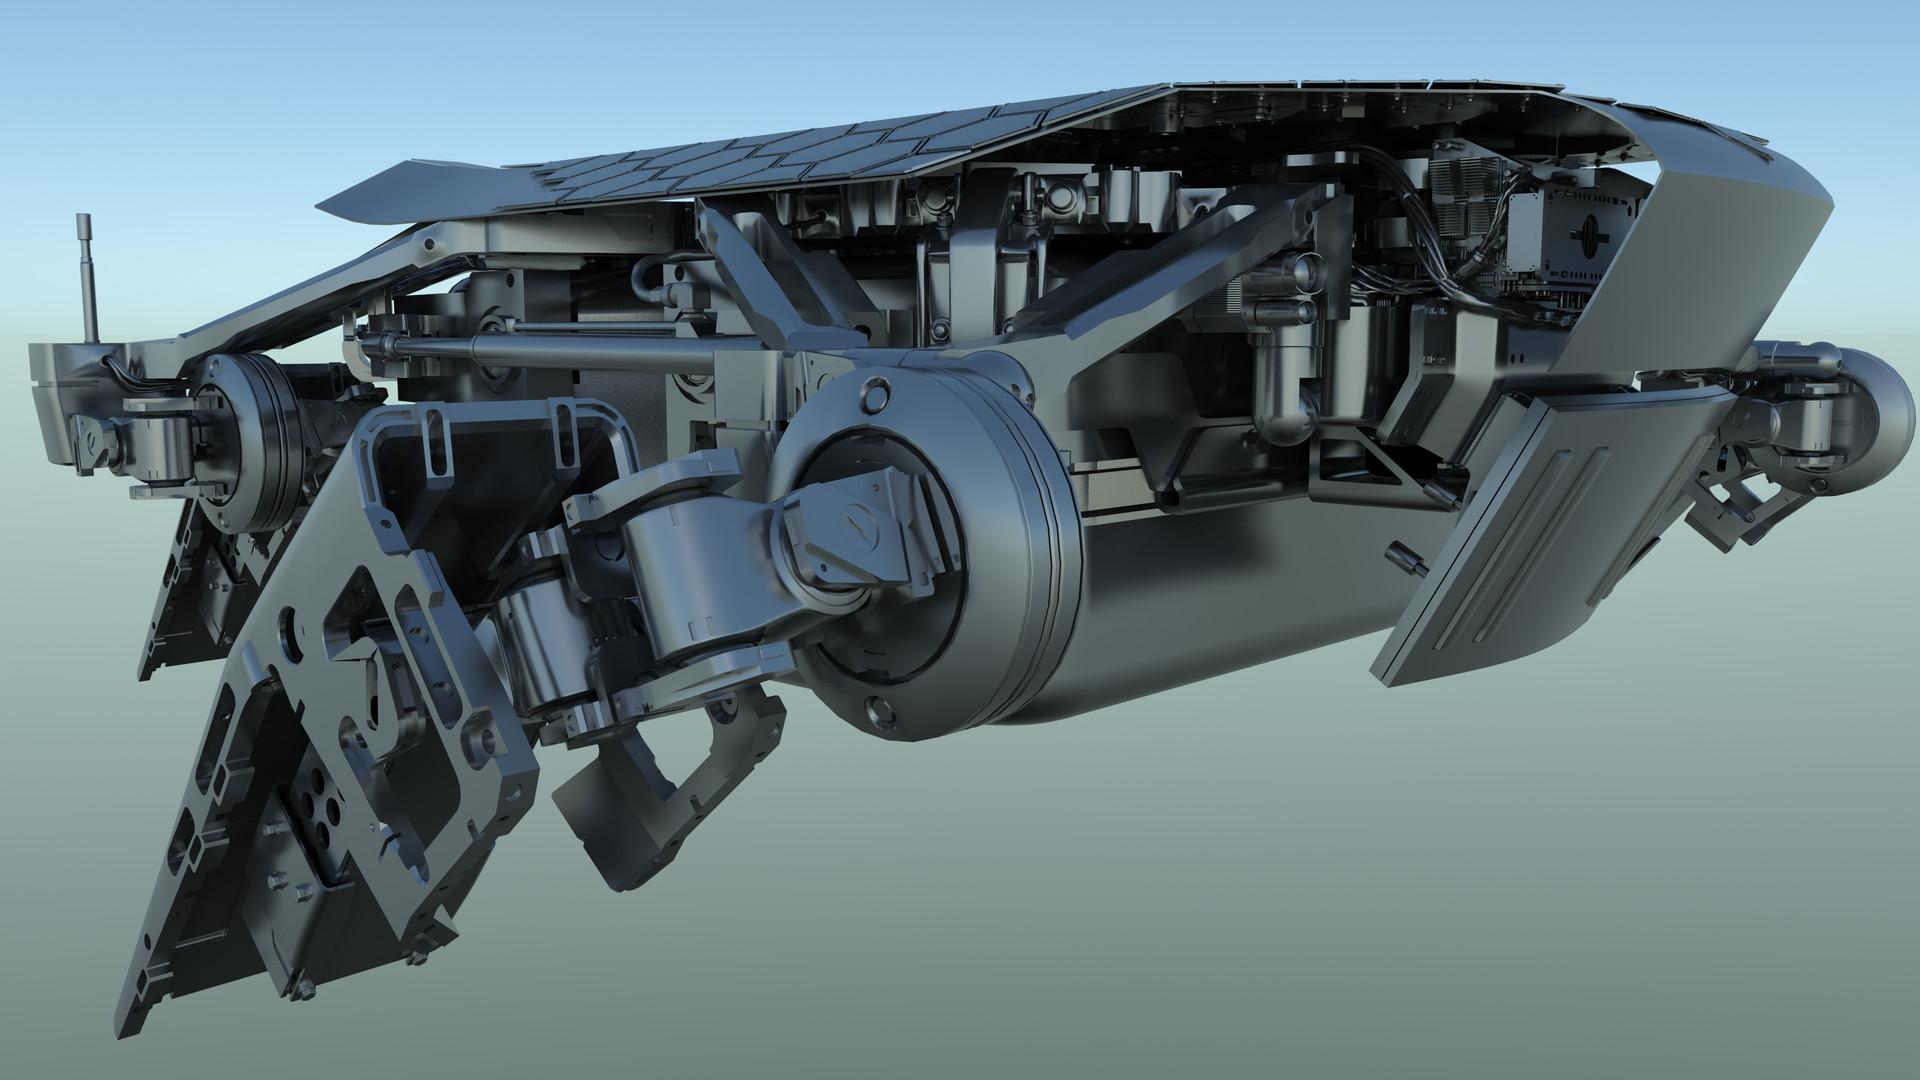 Martin krol drone model render 13